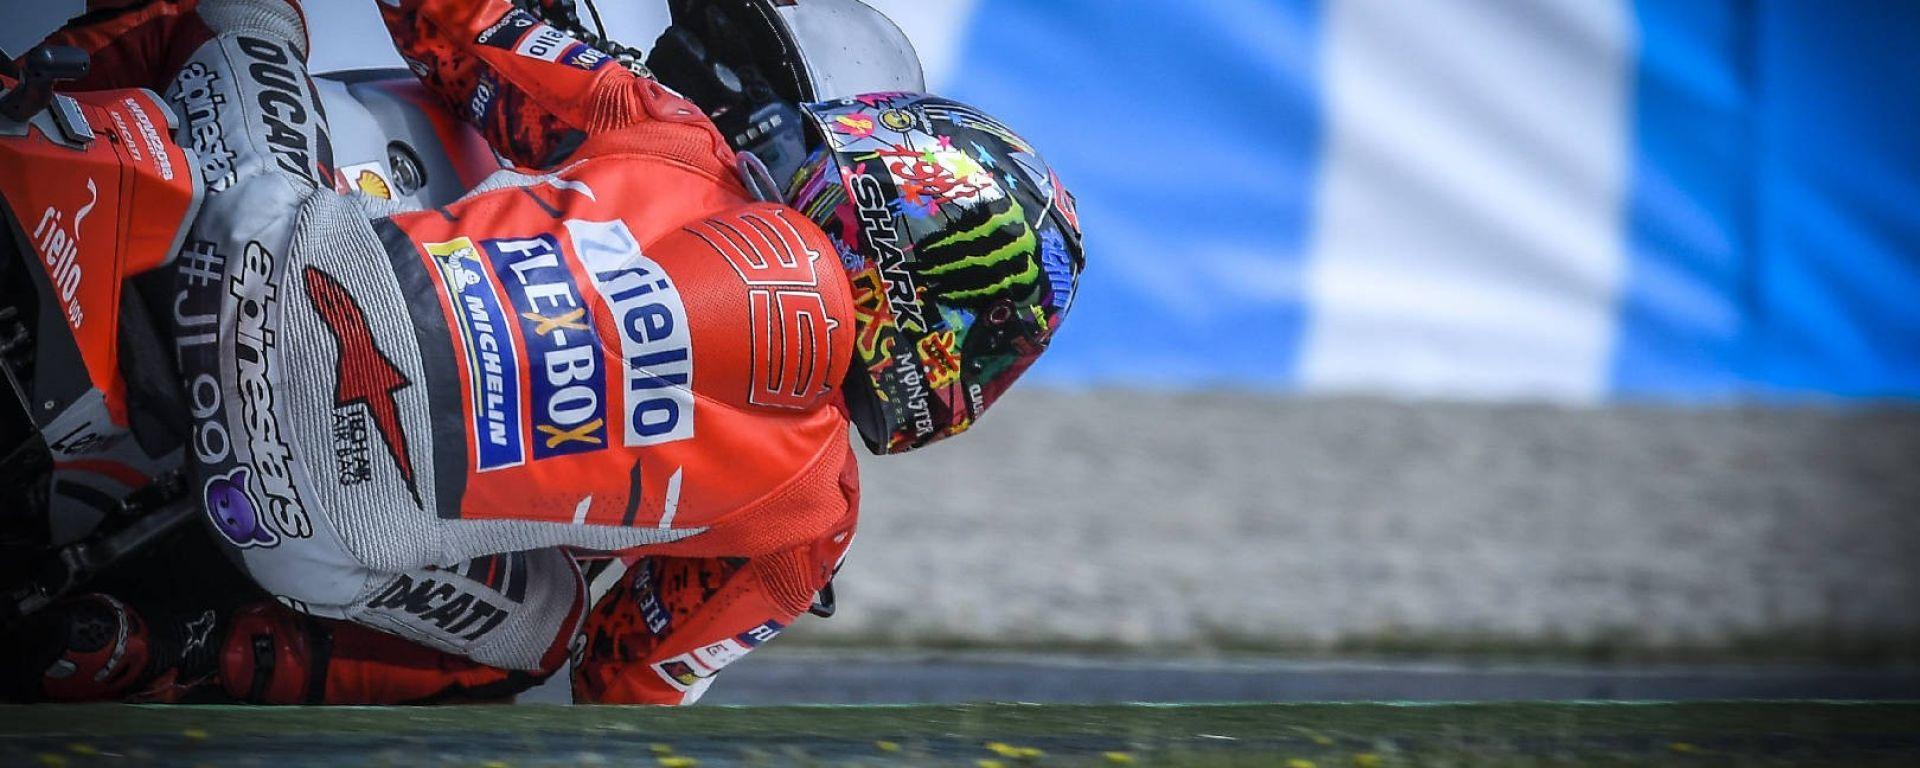 Motogp Barcellona 2018: Lorenzo vince anche in Catalunya